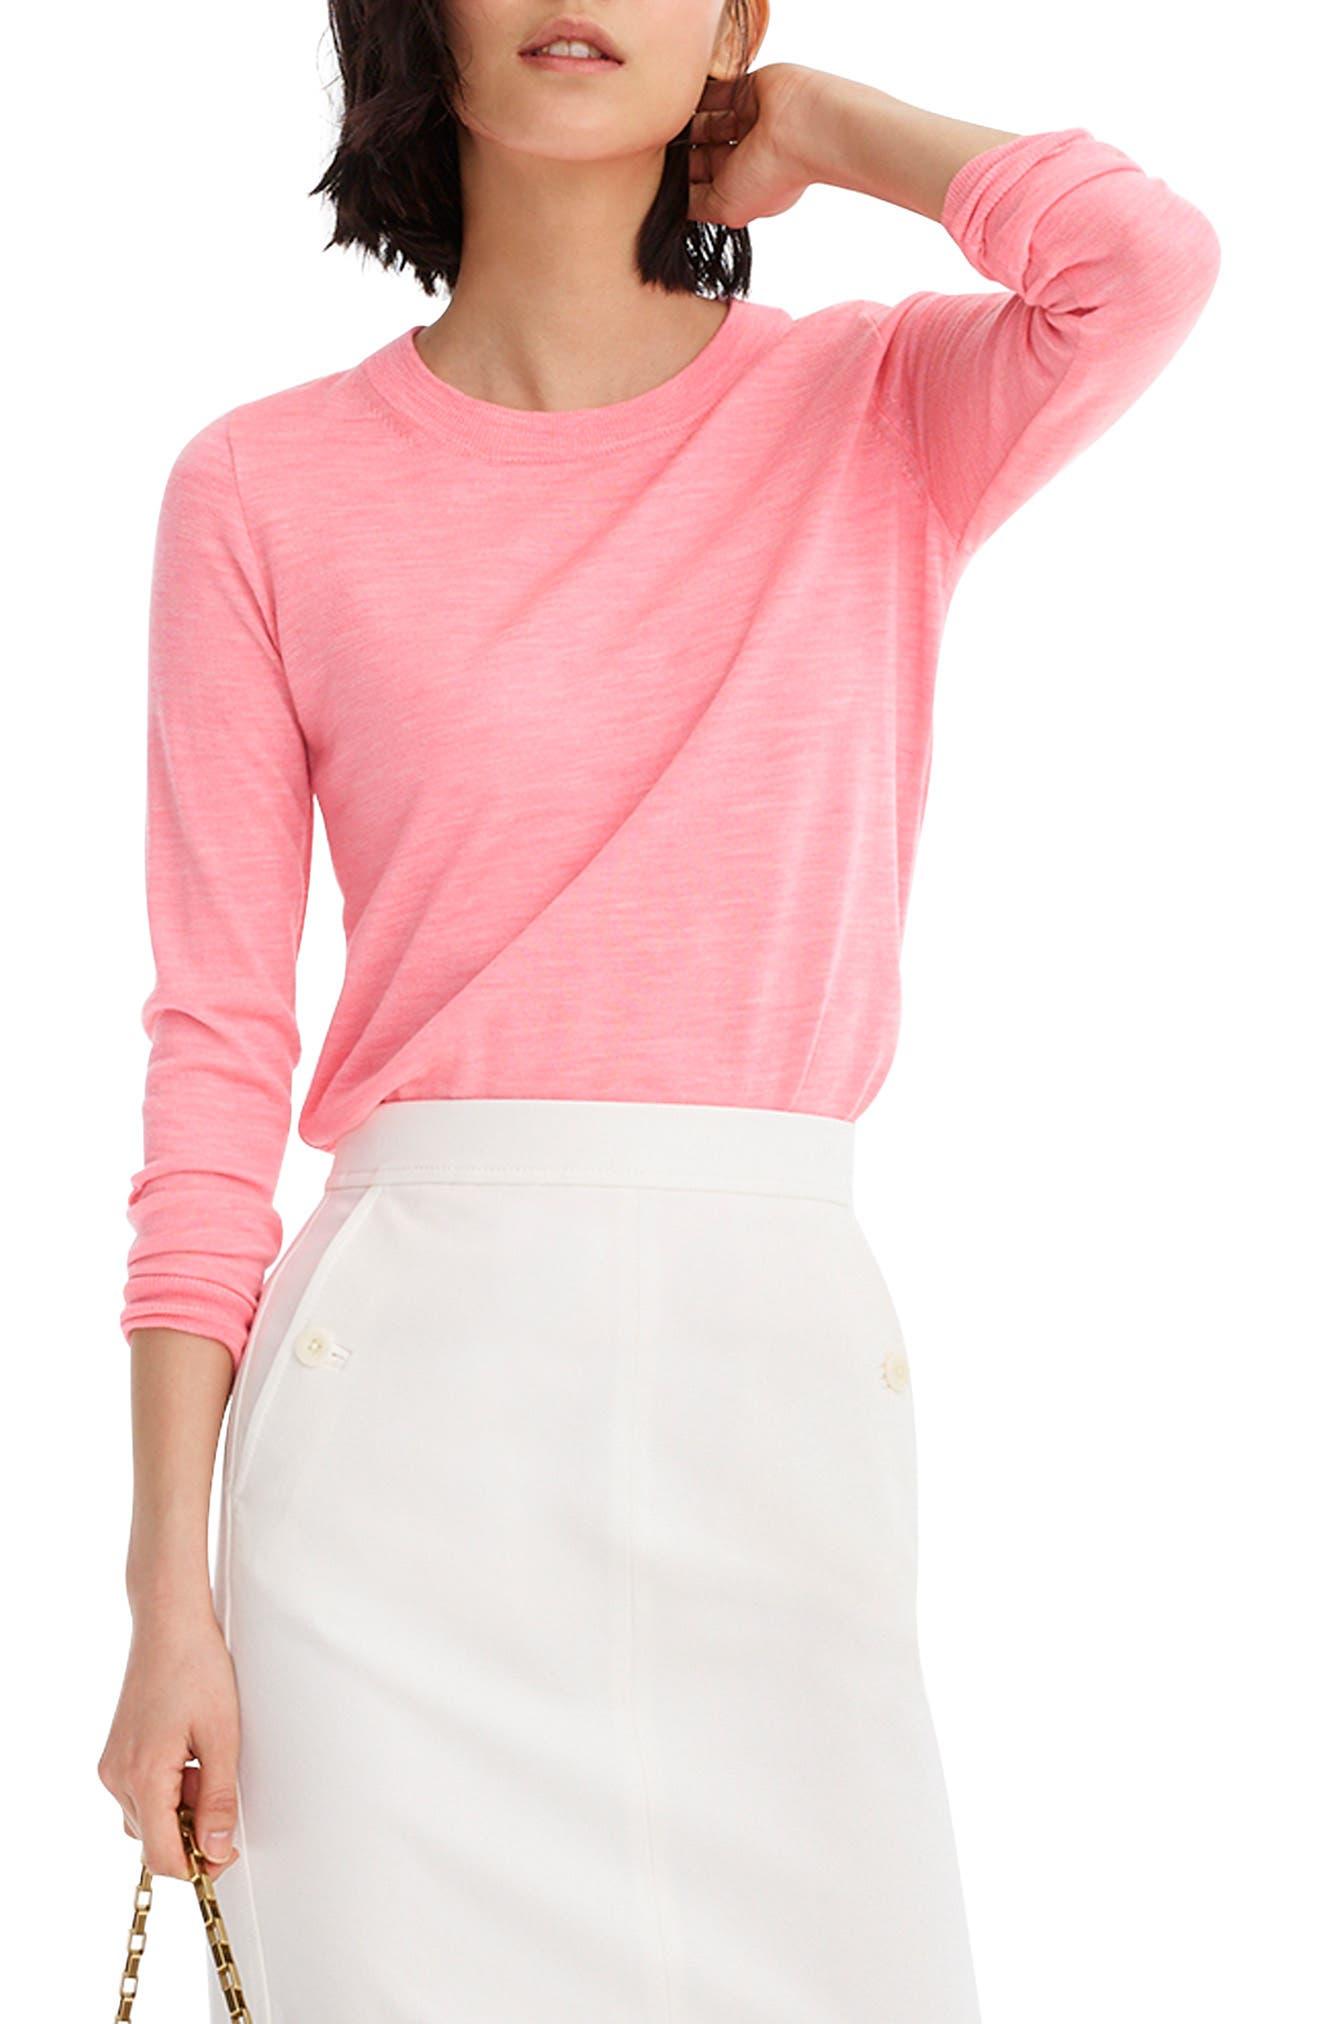 Plus Size J.crew Tippi Merino Wool Sweater, Pink